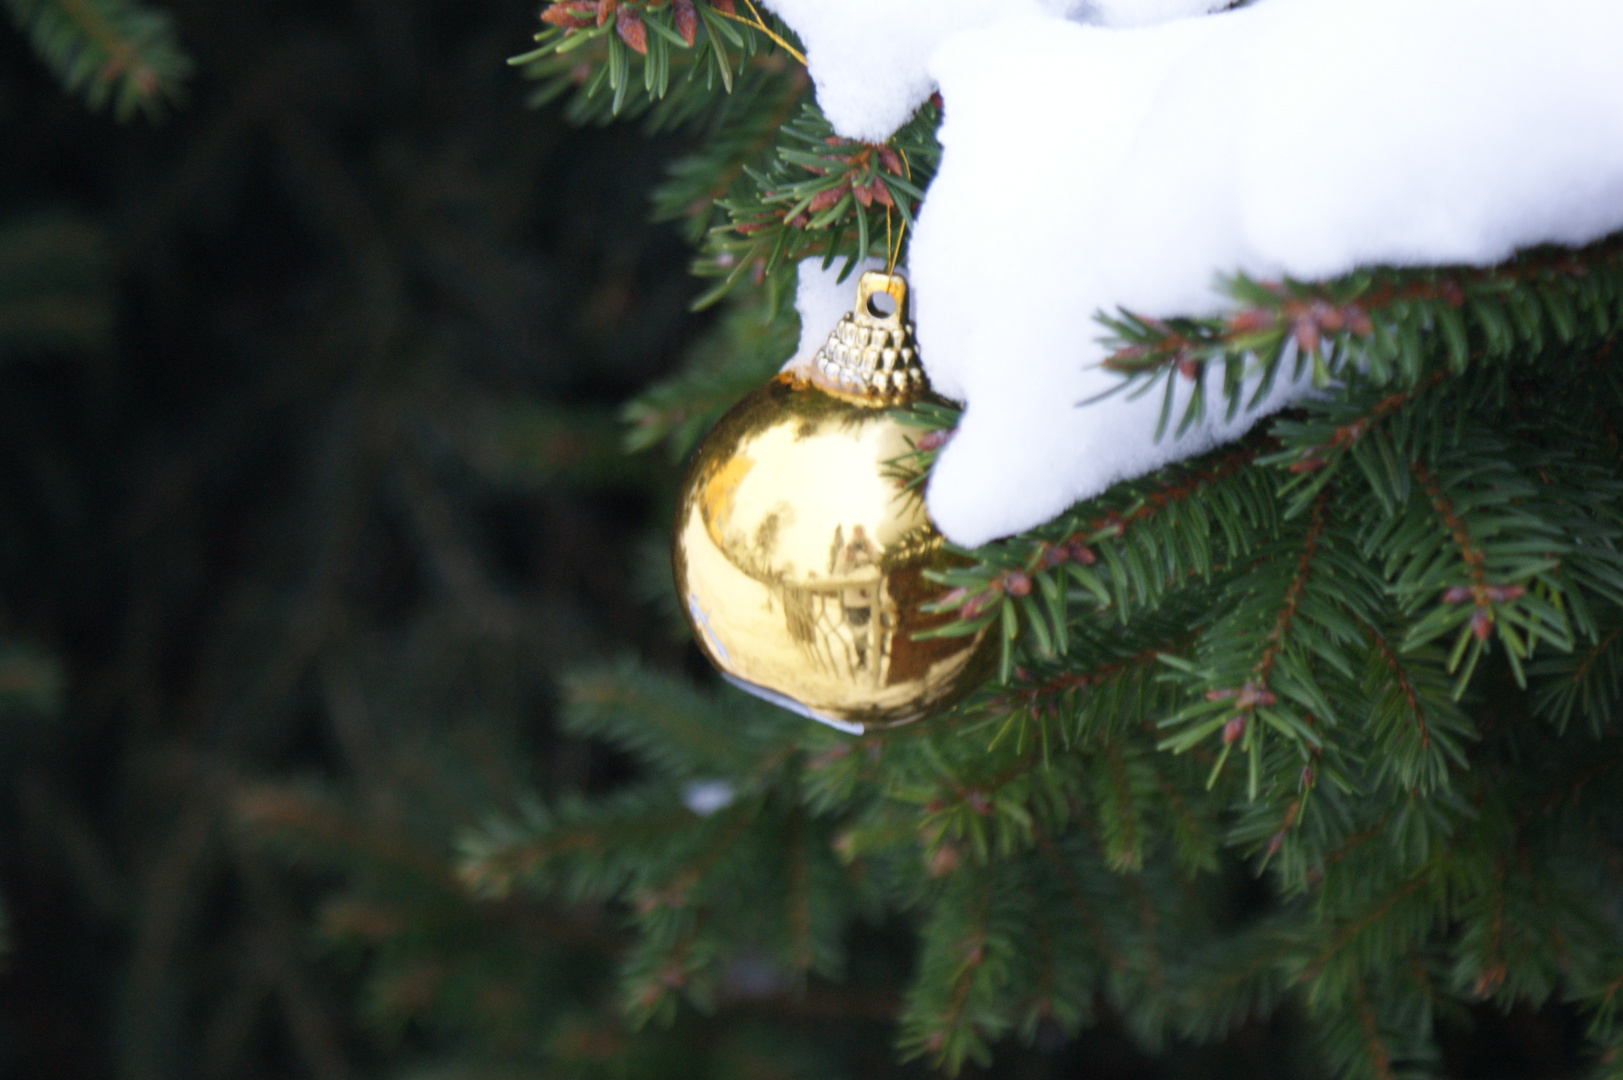 Weihnachtskugel im Januar